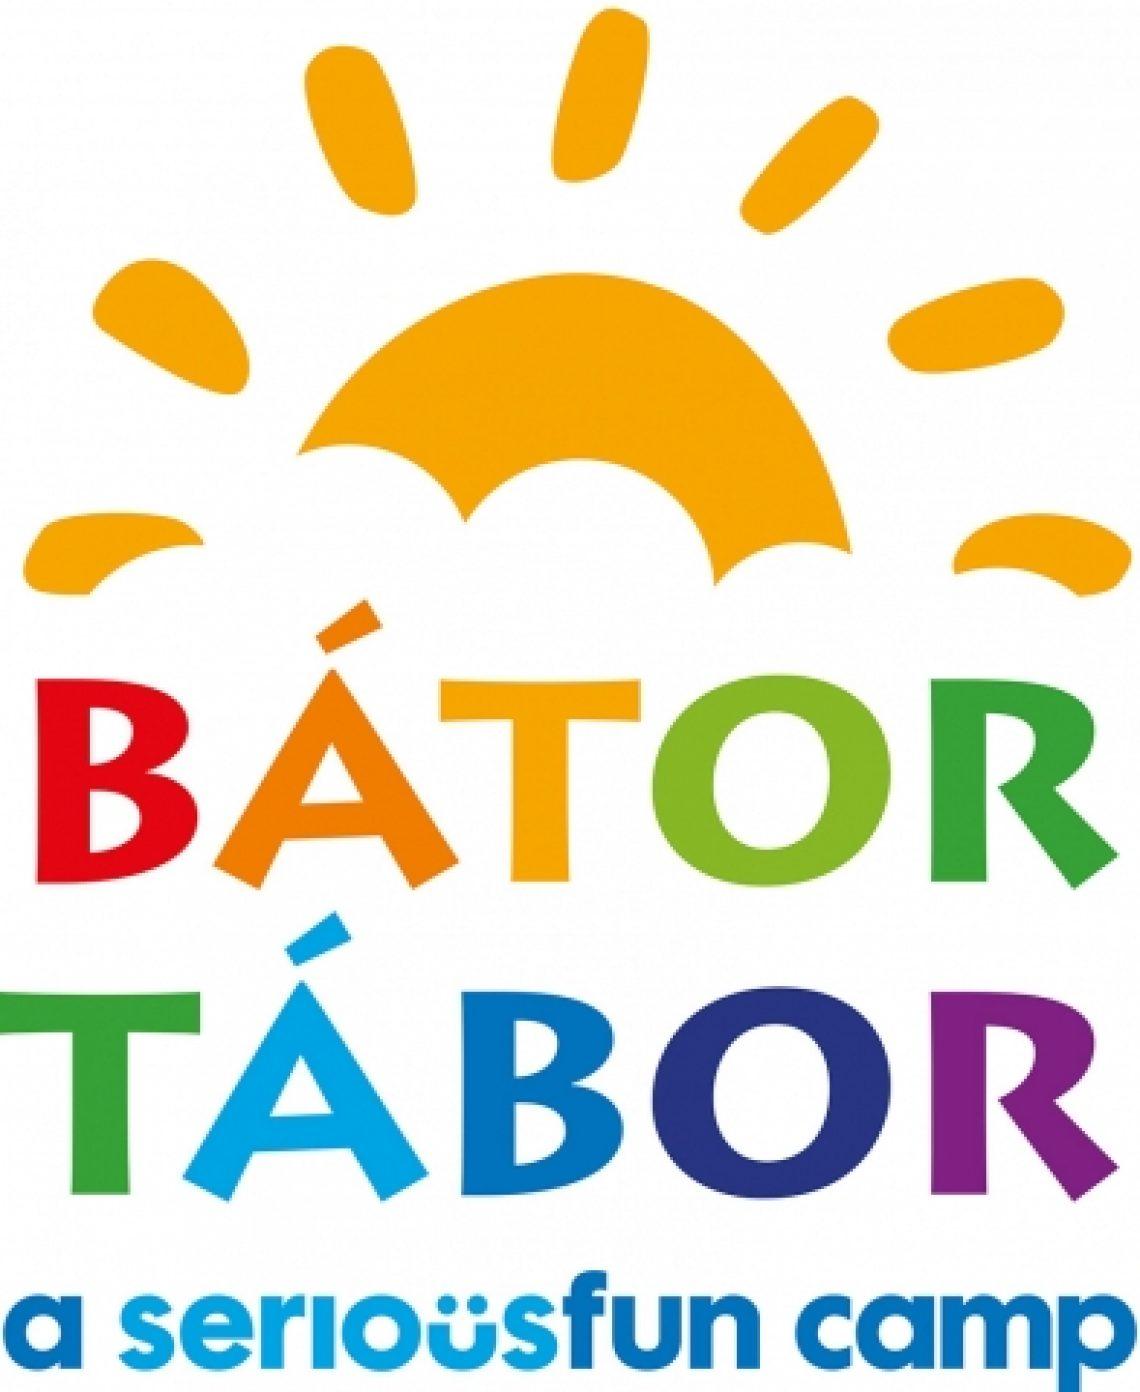 batortabor_logo